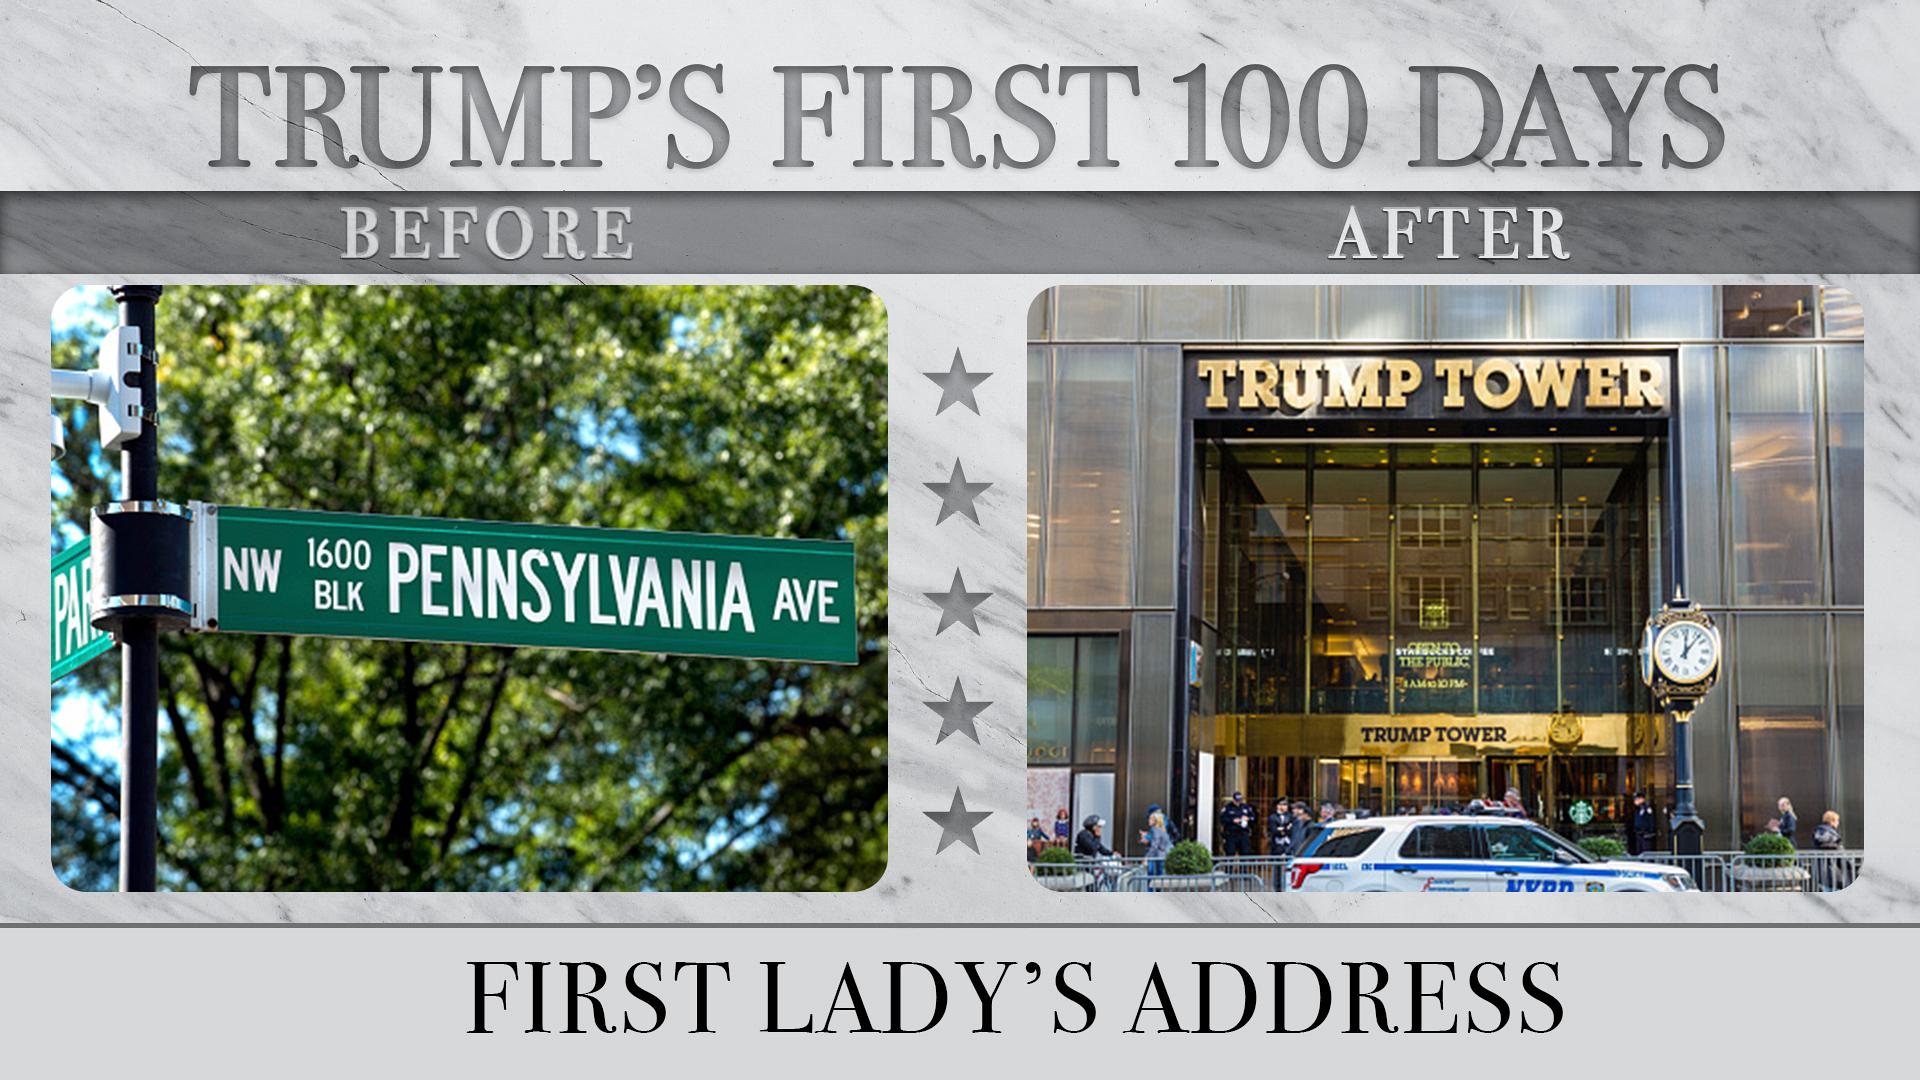 First Lady's Address